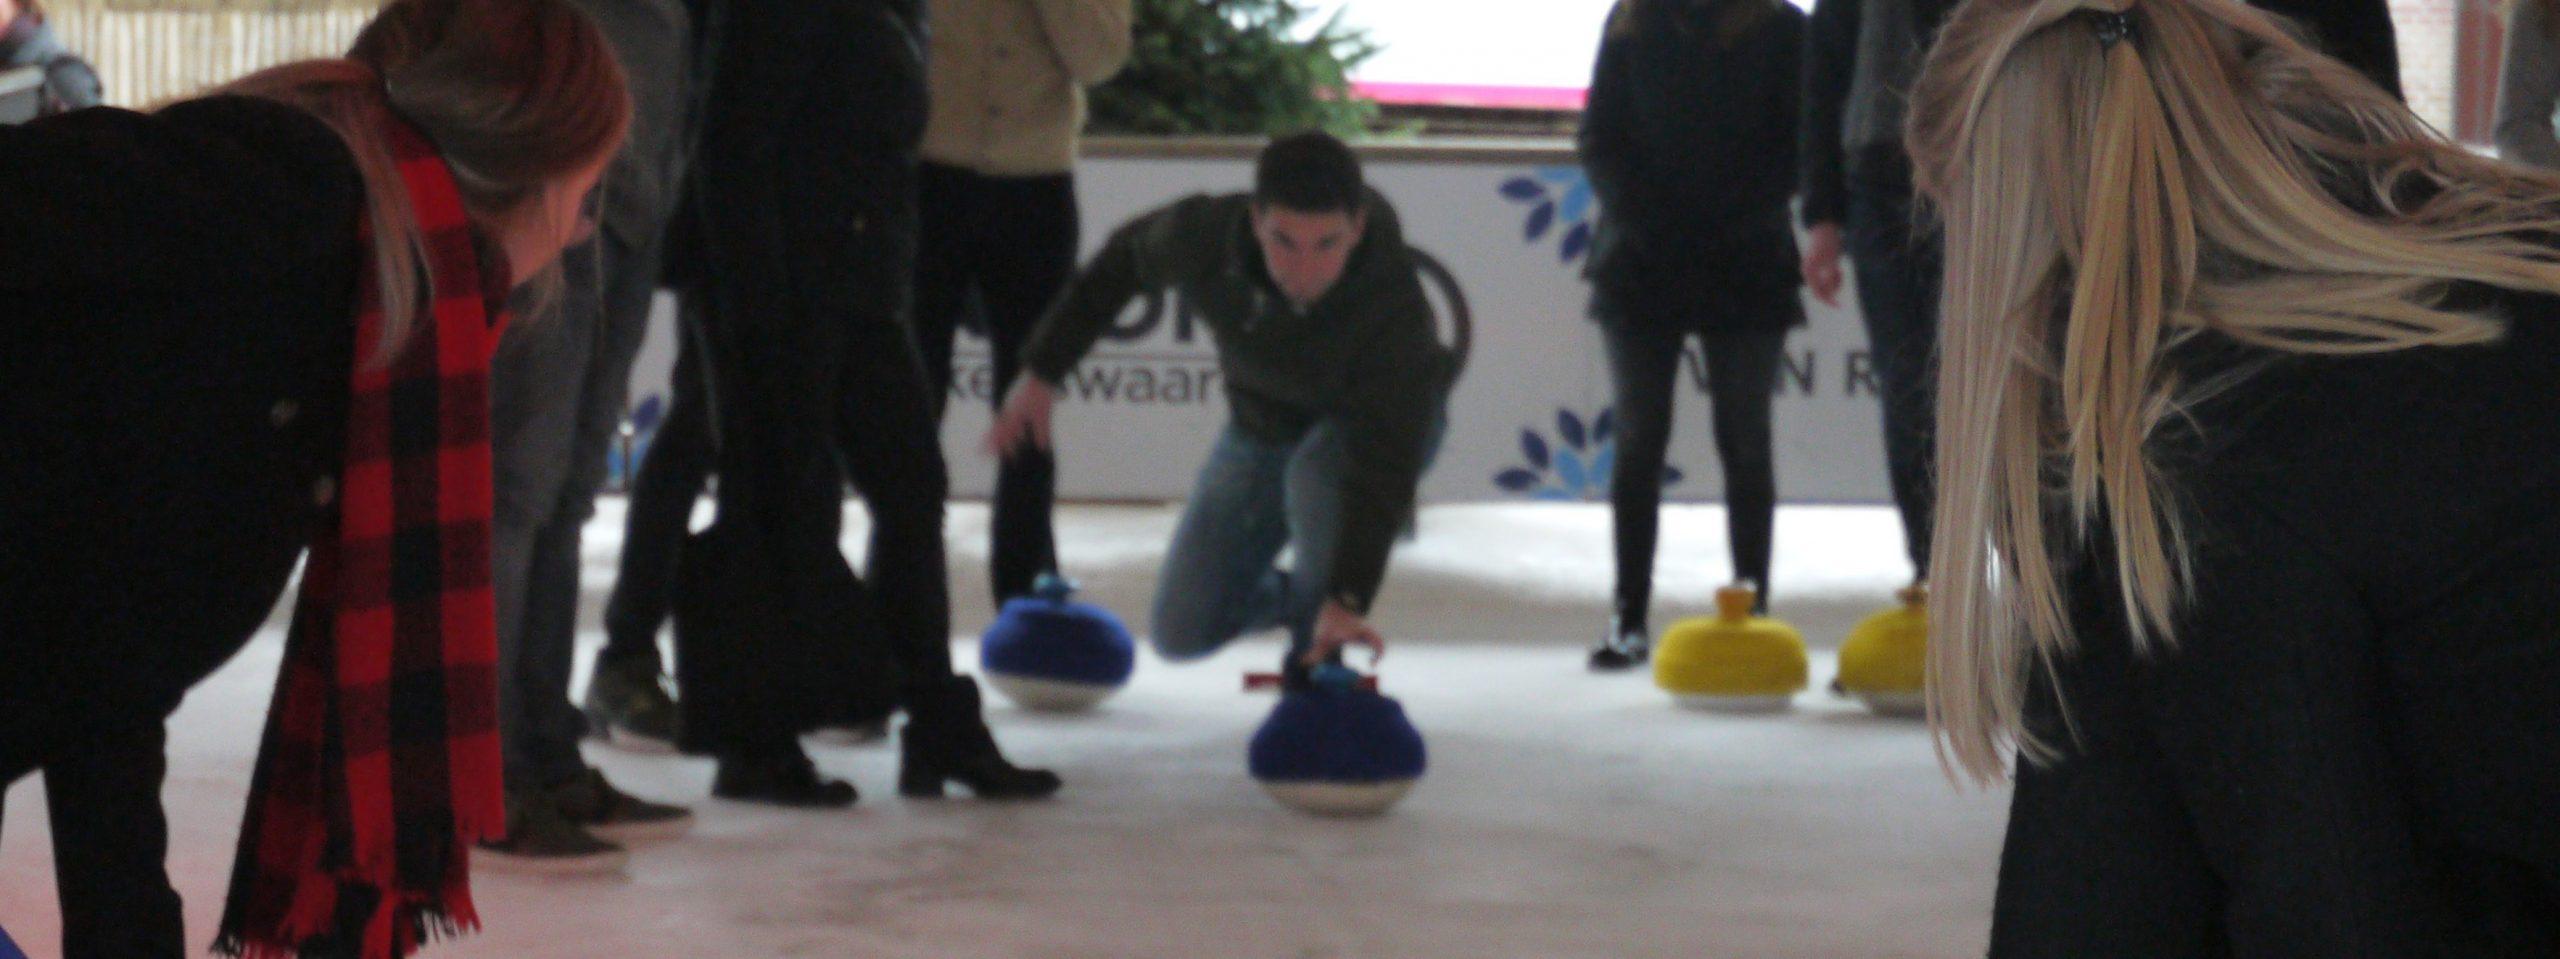 teamuitje-den-bosch-workshop-fun-curling